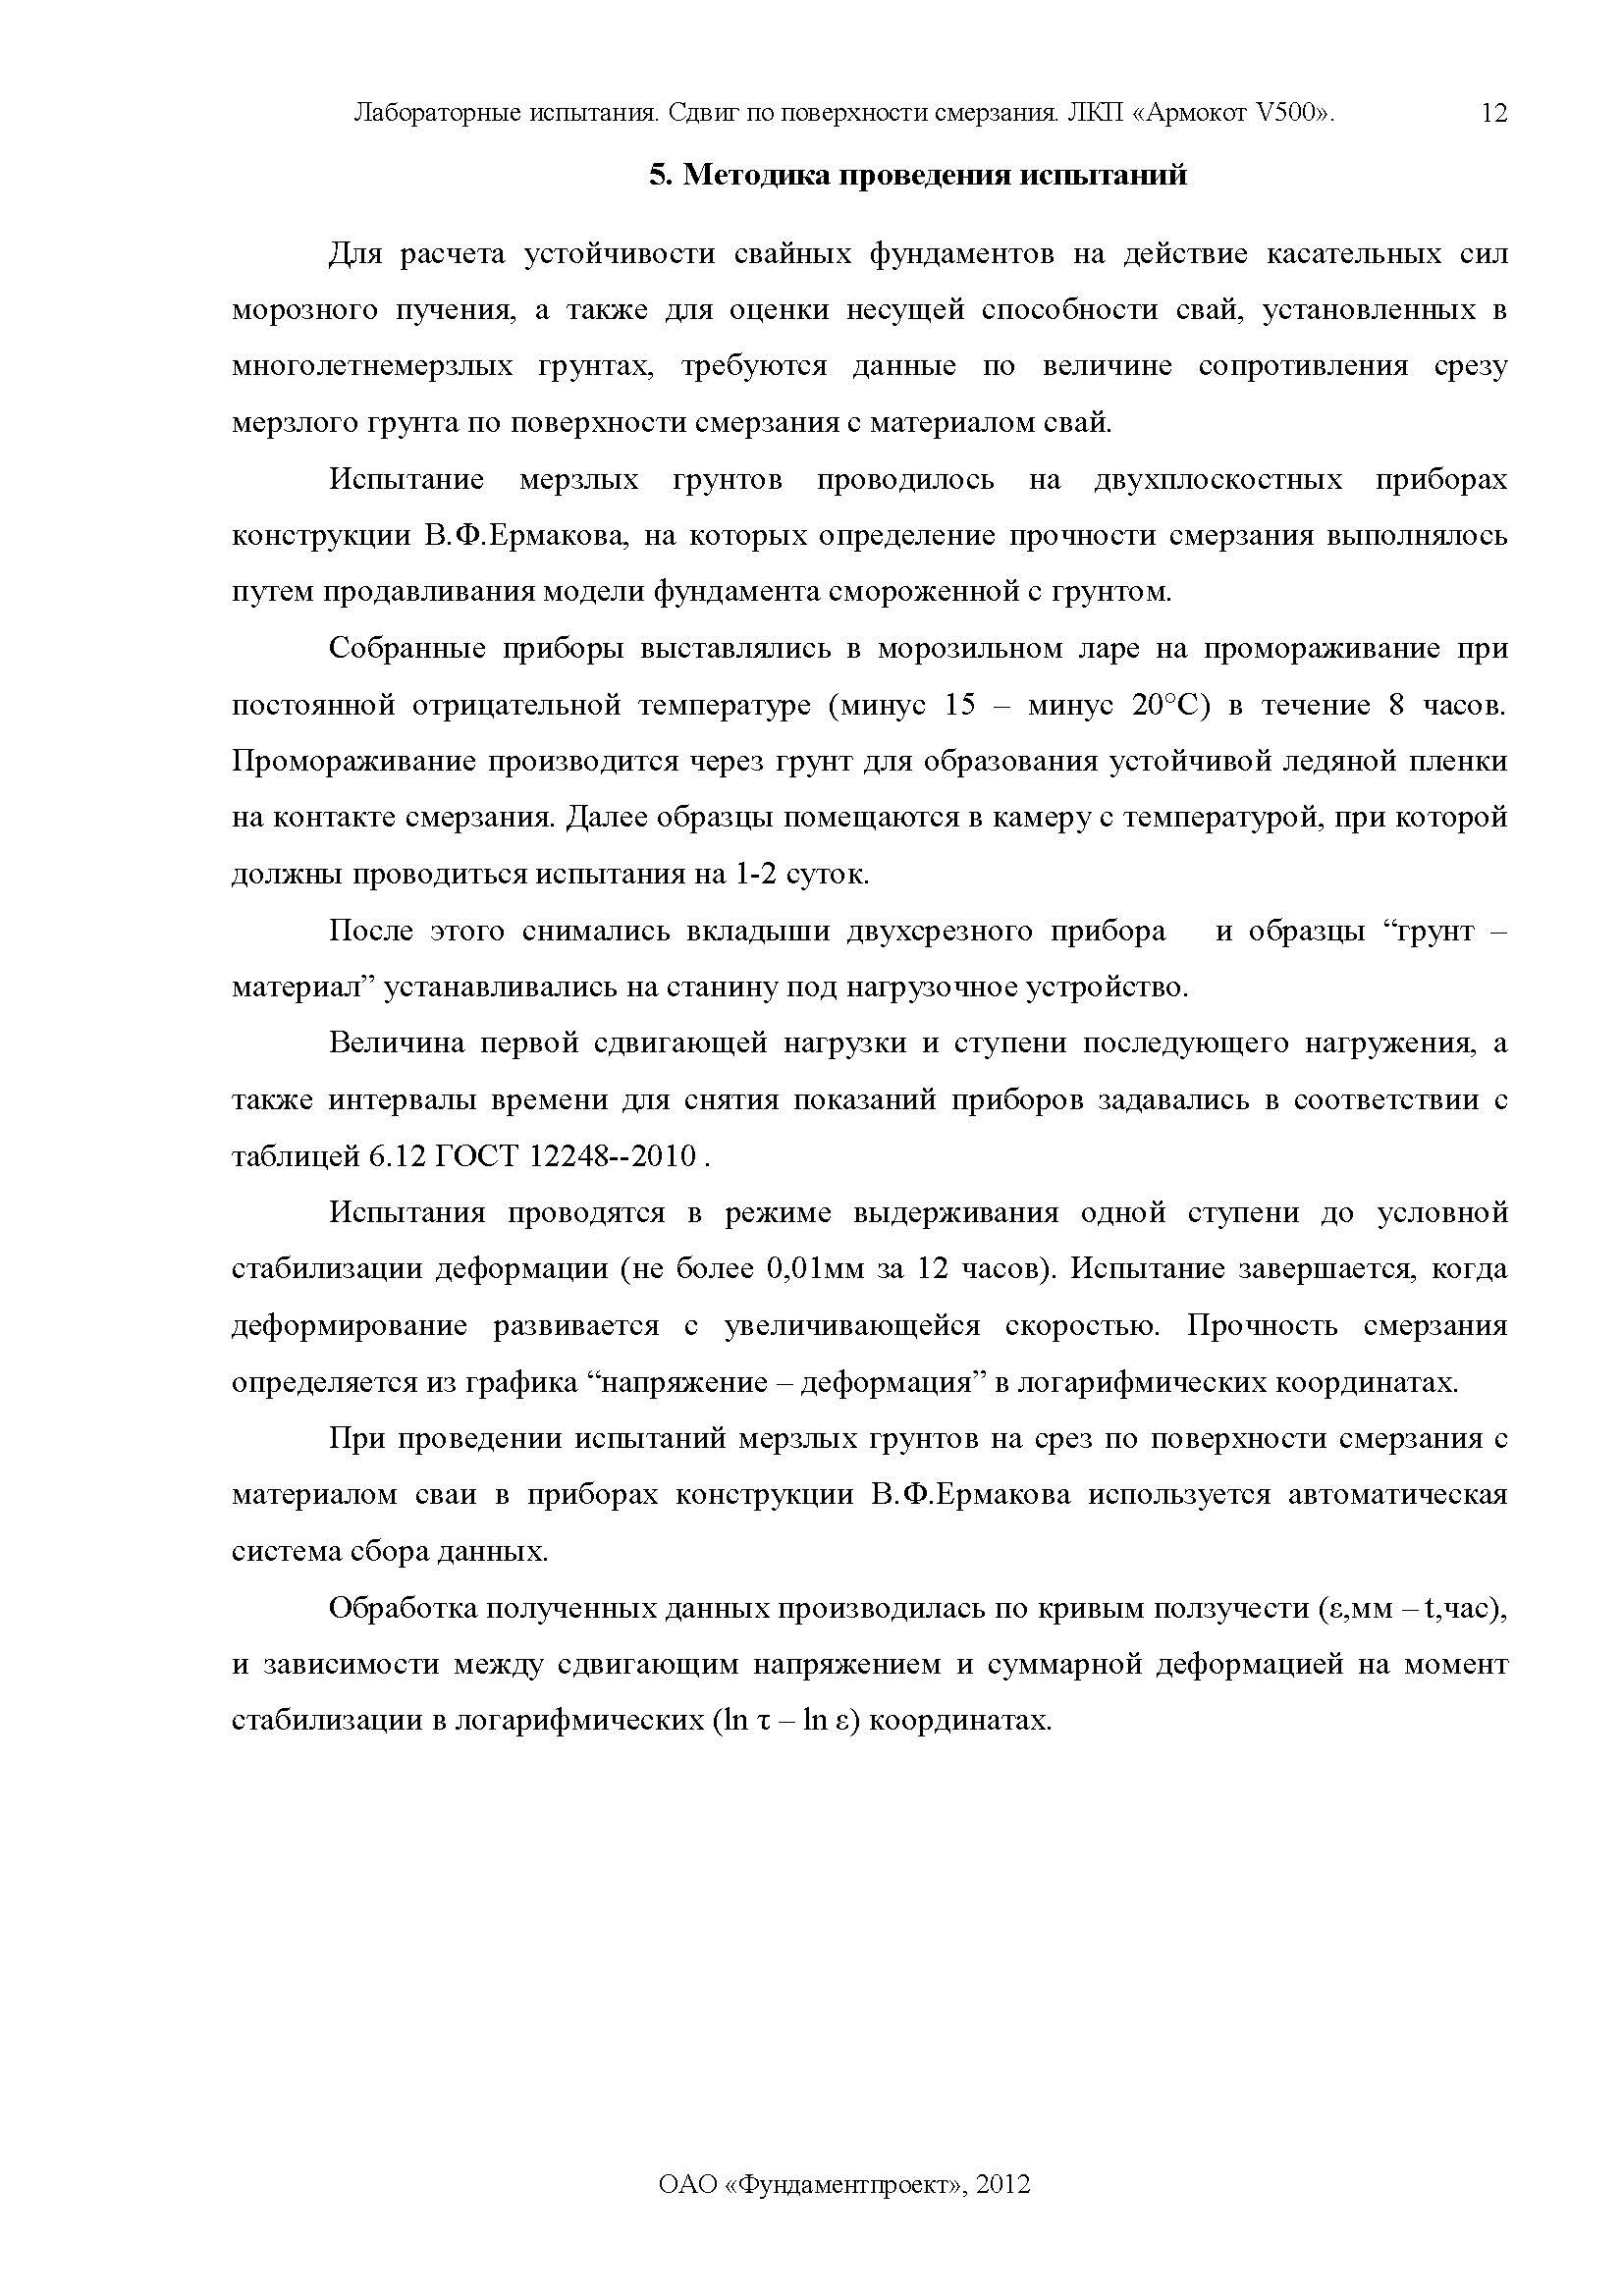 Отчет по сваям Армокот V500 Фундаментпроект_Страница_12